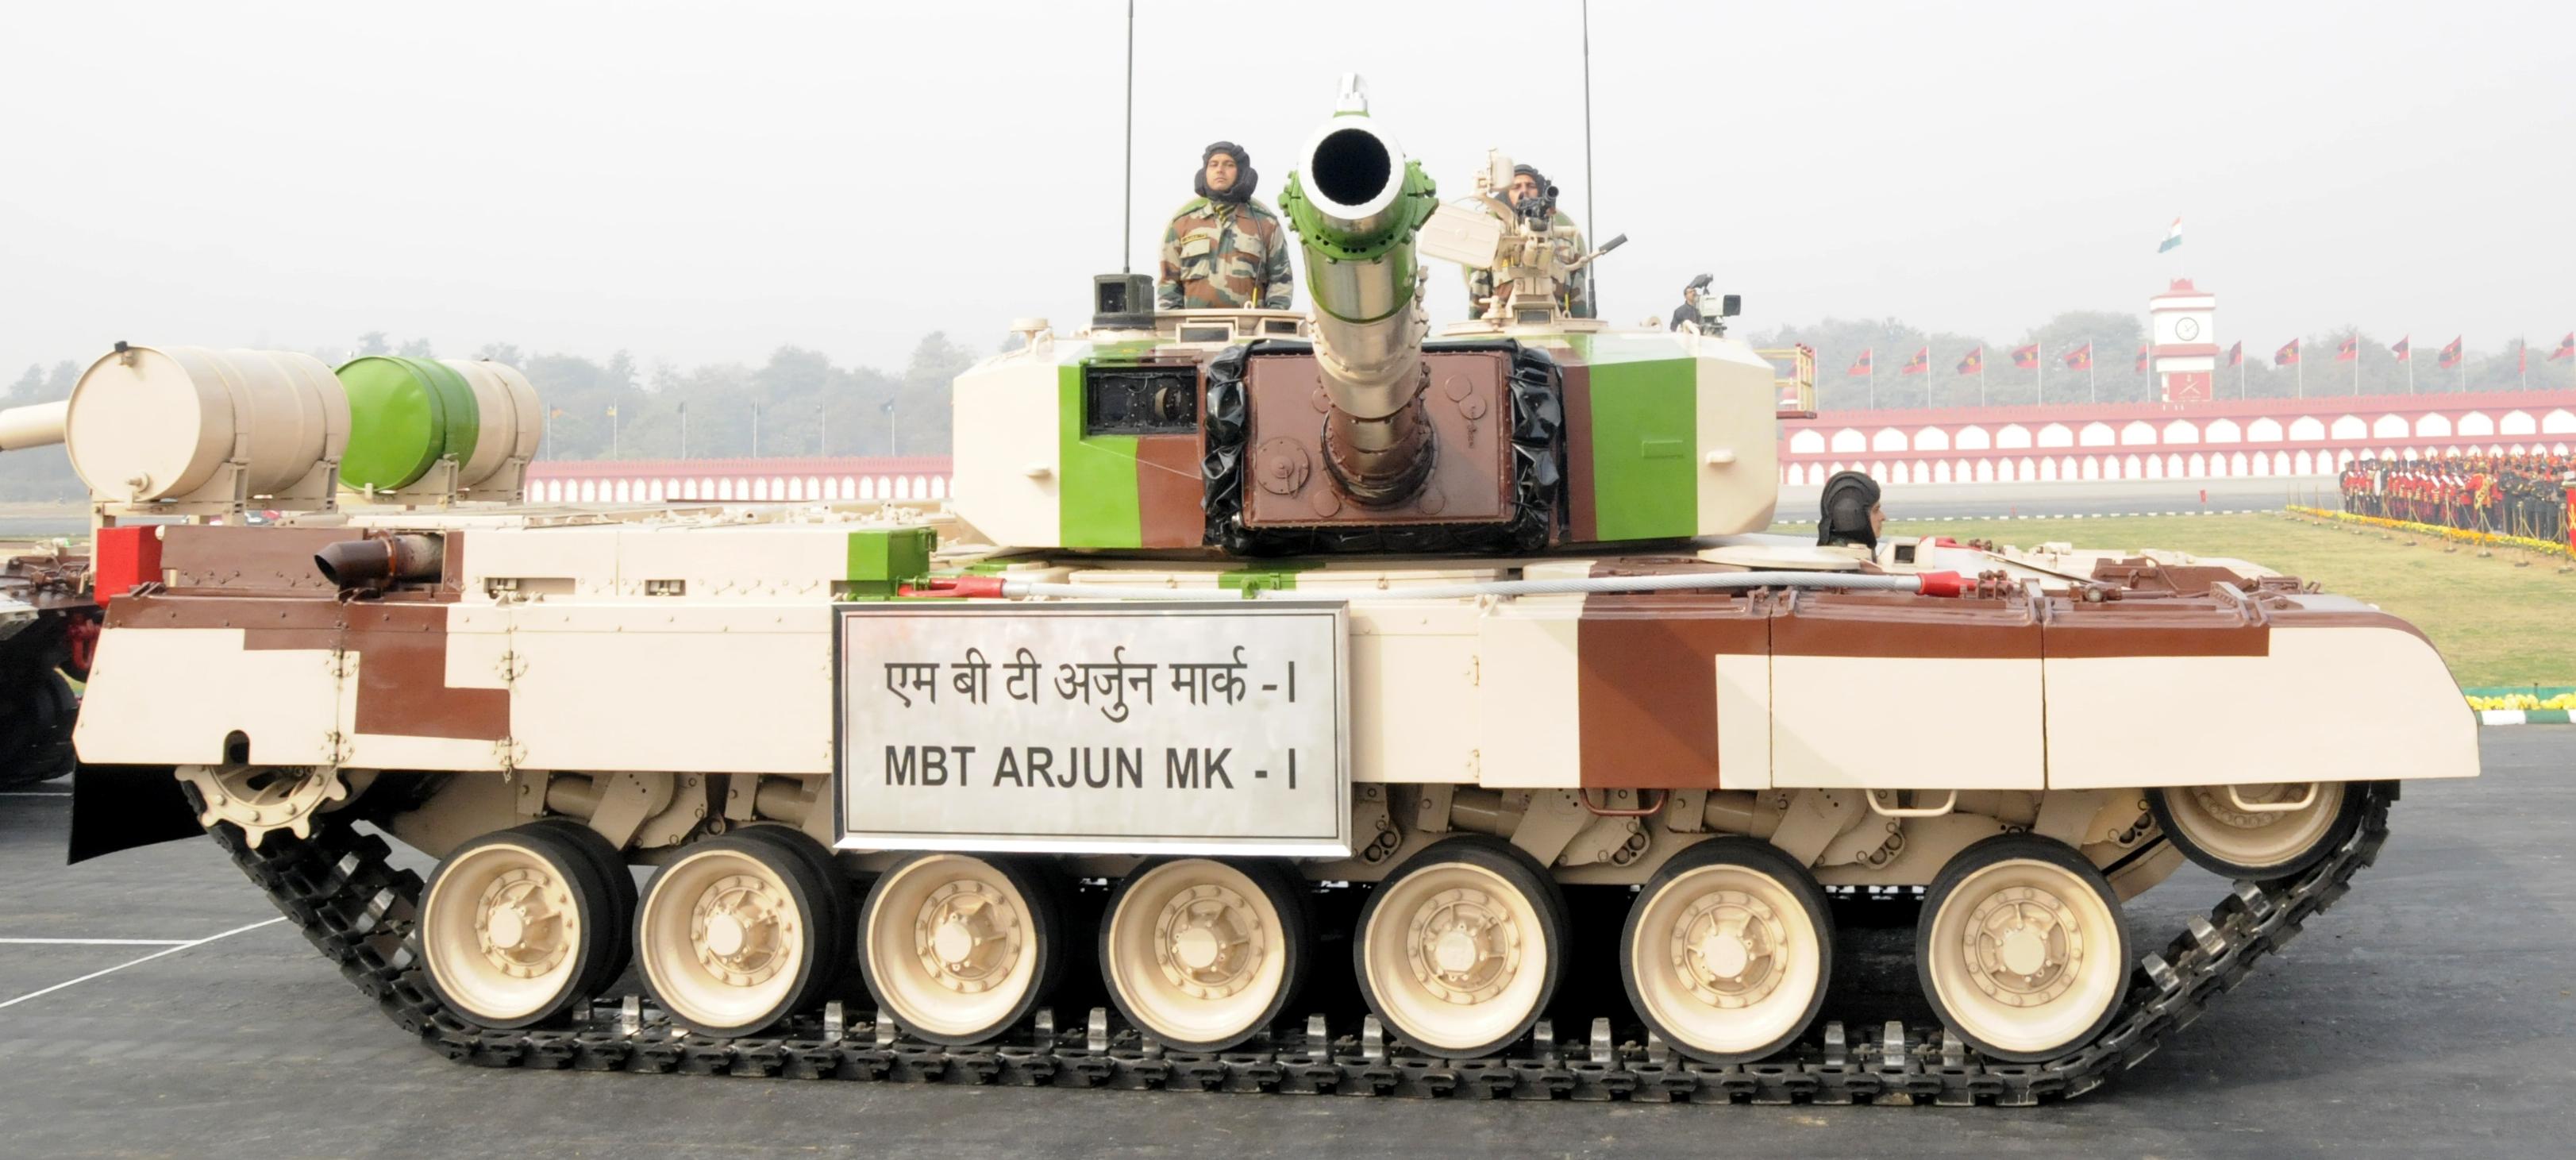 File:Arjun Tank.jpg - Wikimedia Commons